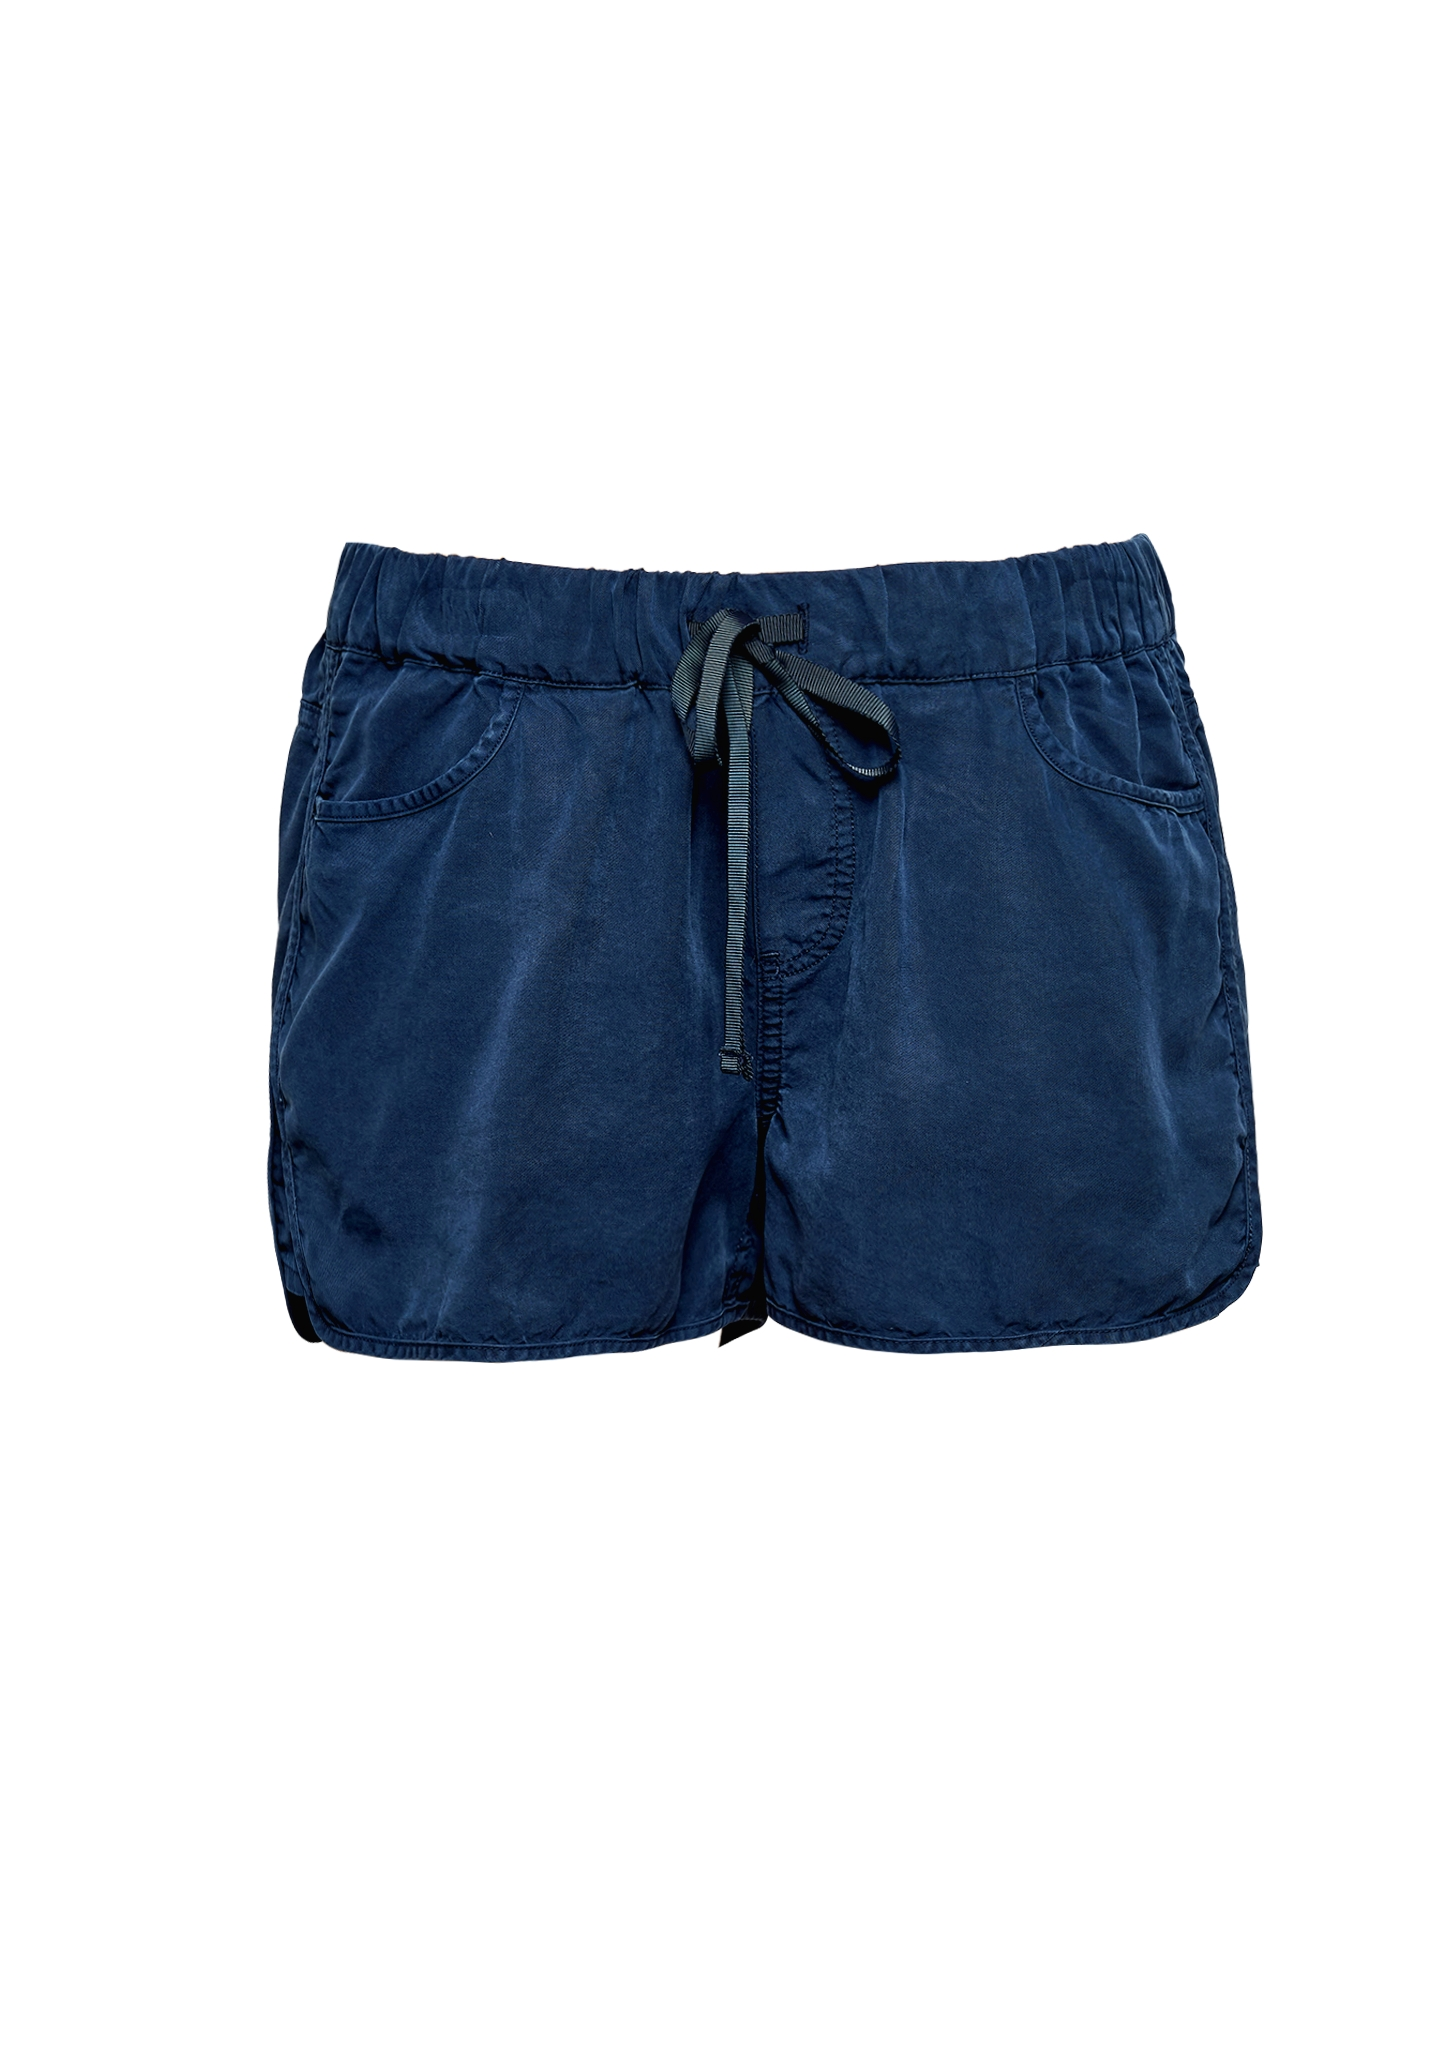 Hotpants | Bekleidung > Hosen > Hotpants | Blau | 100% lyocell | Q/S designed by